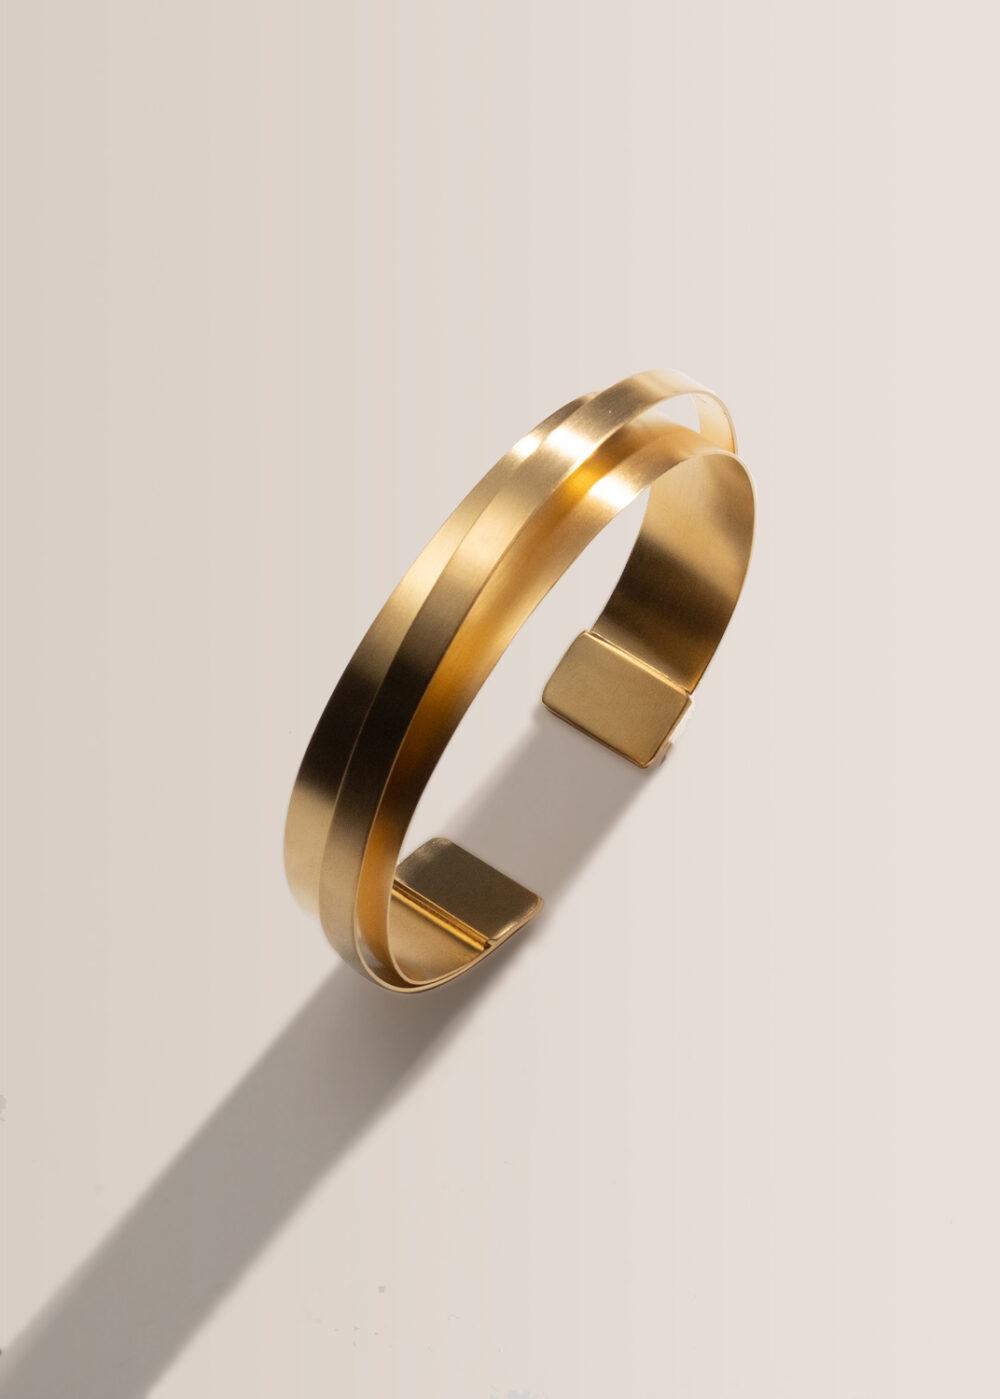 Olympia-armreif-m-klein-gold-matt